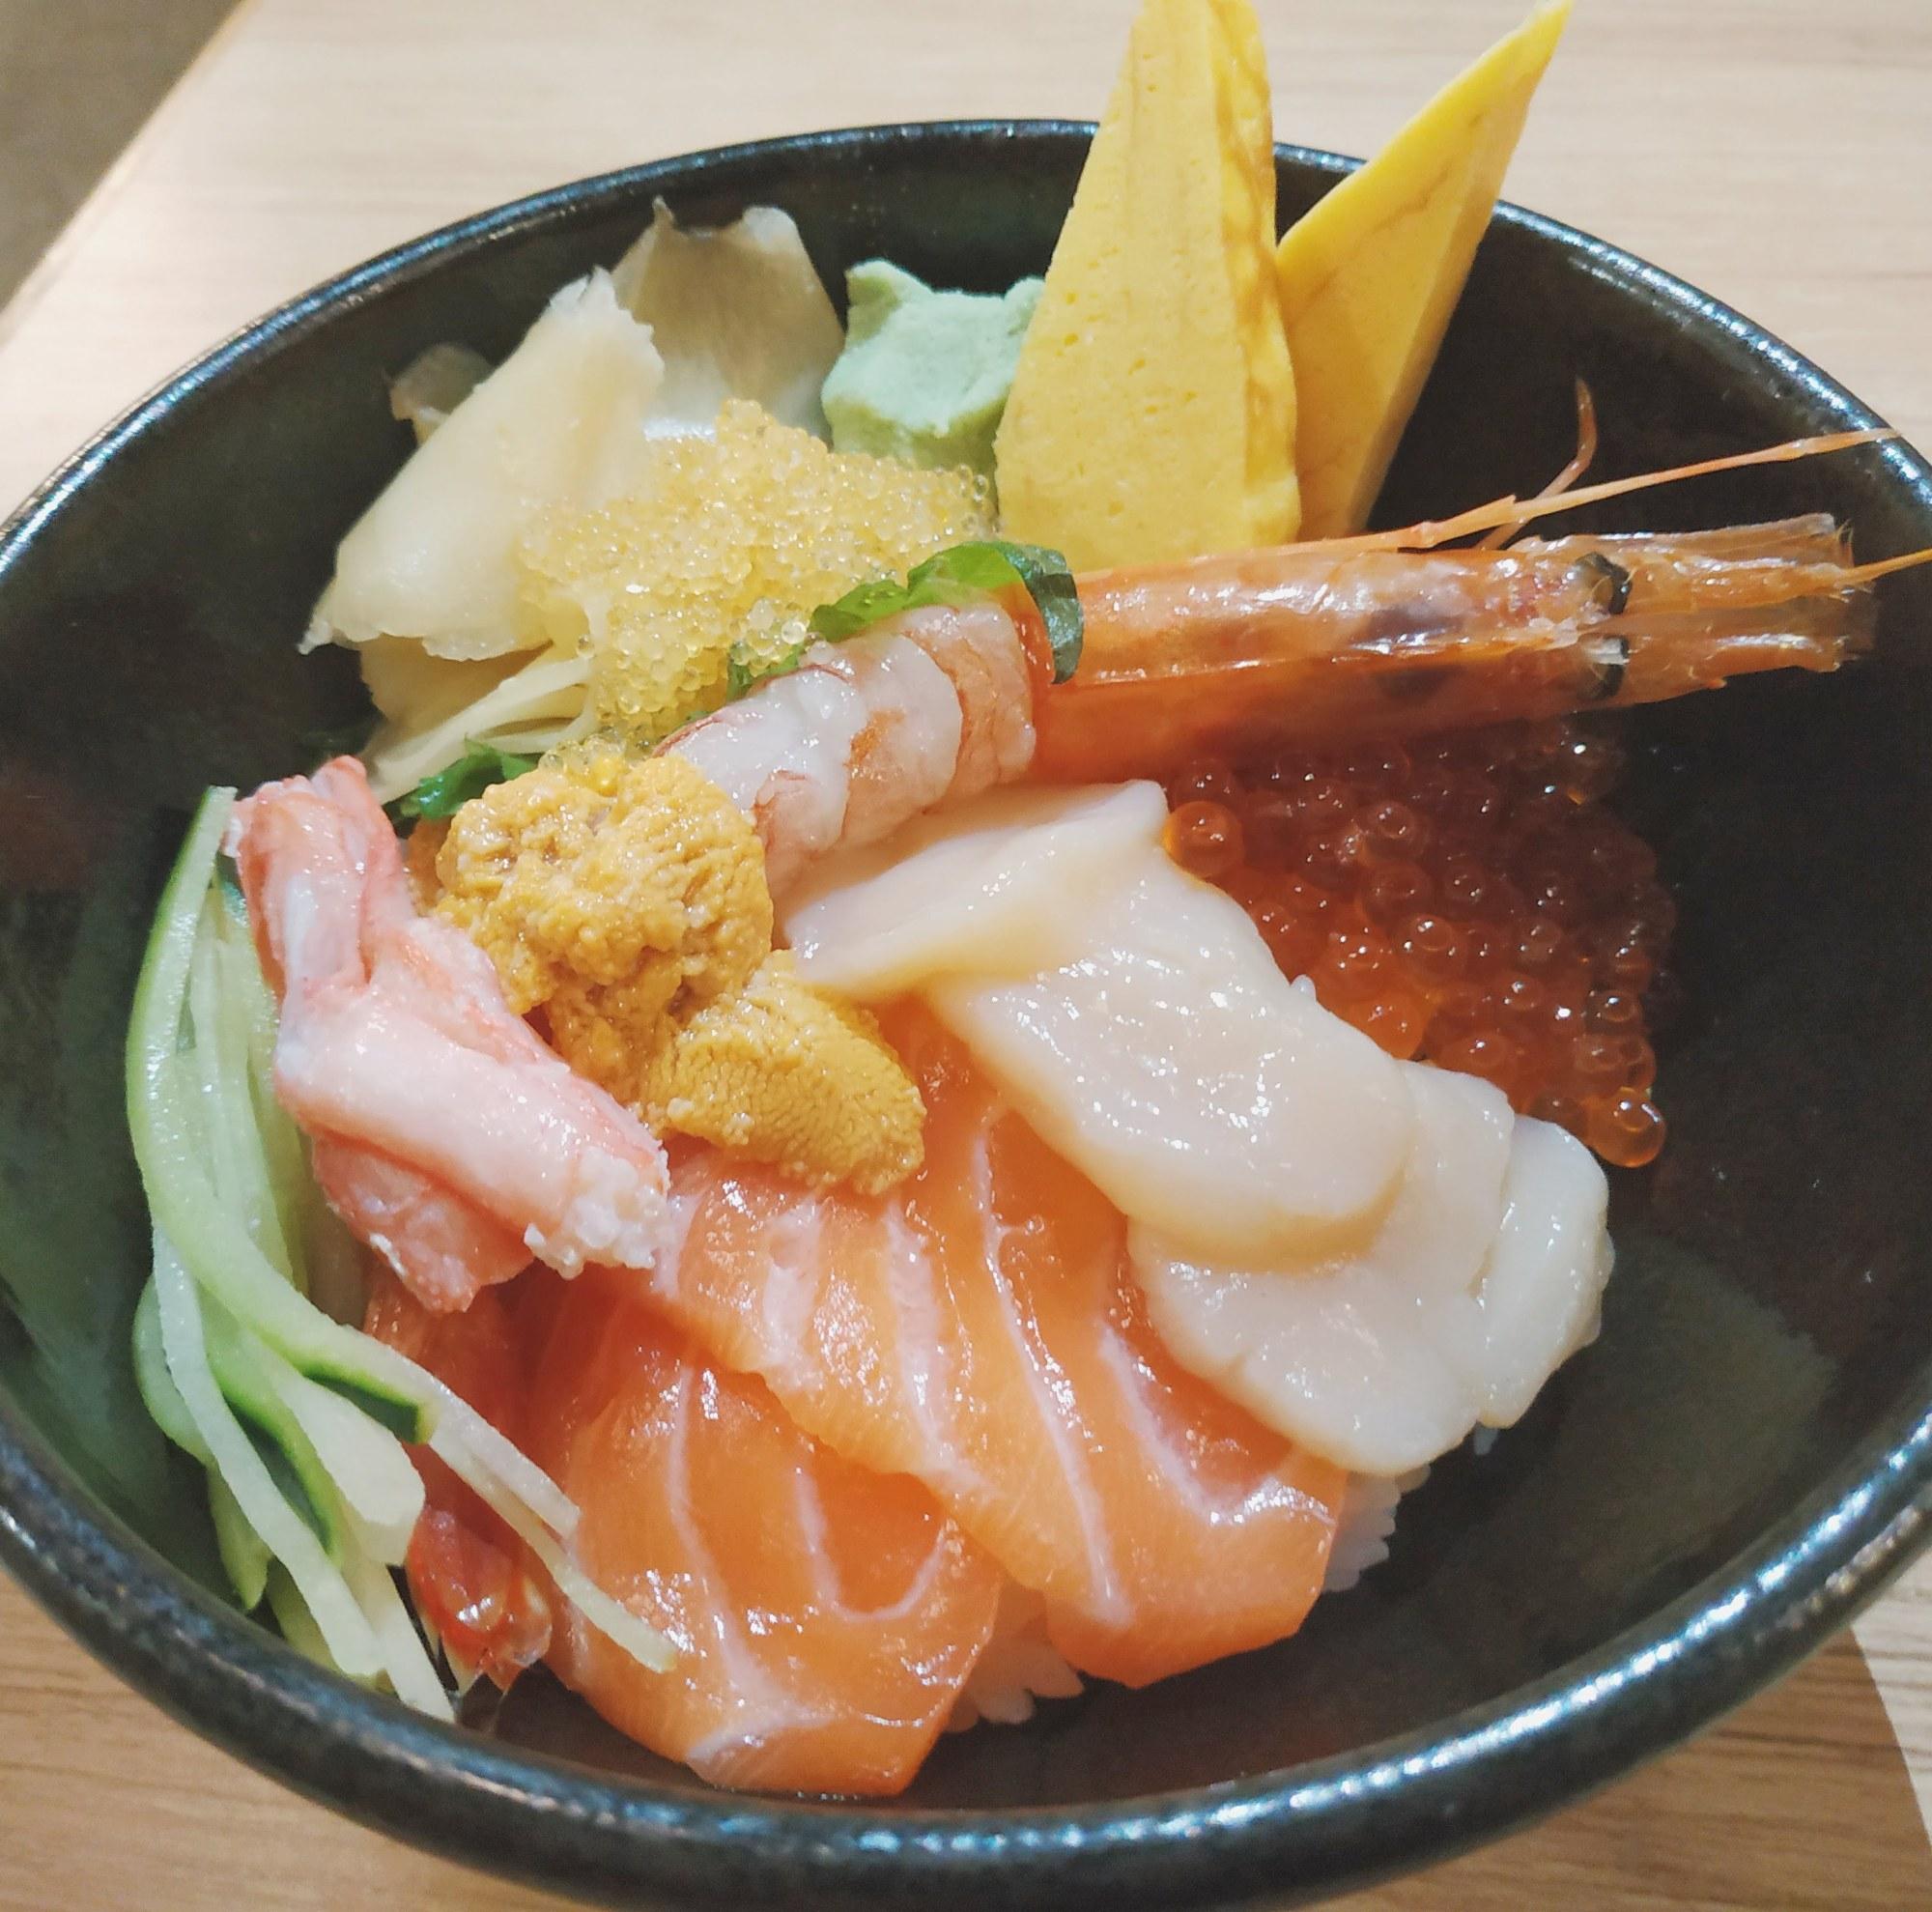 Hokkaido Don Tsukiji Fish Market Orchard Central